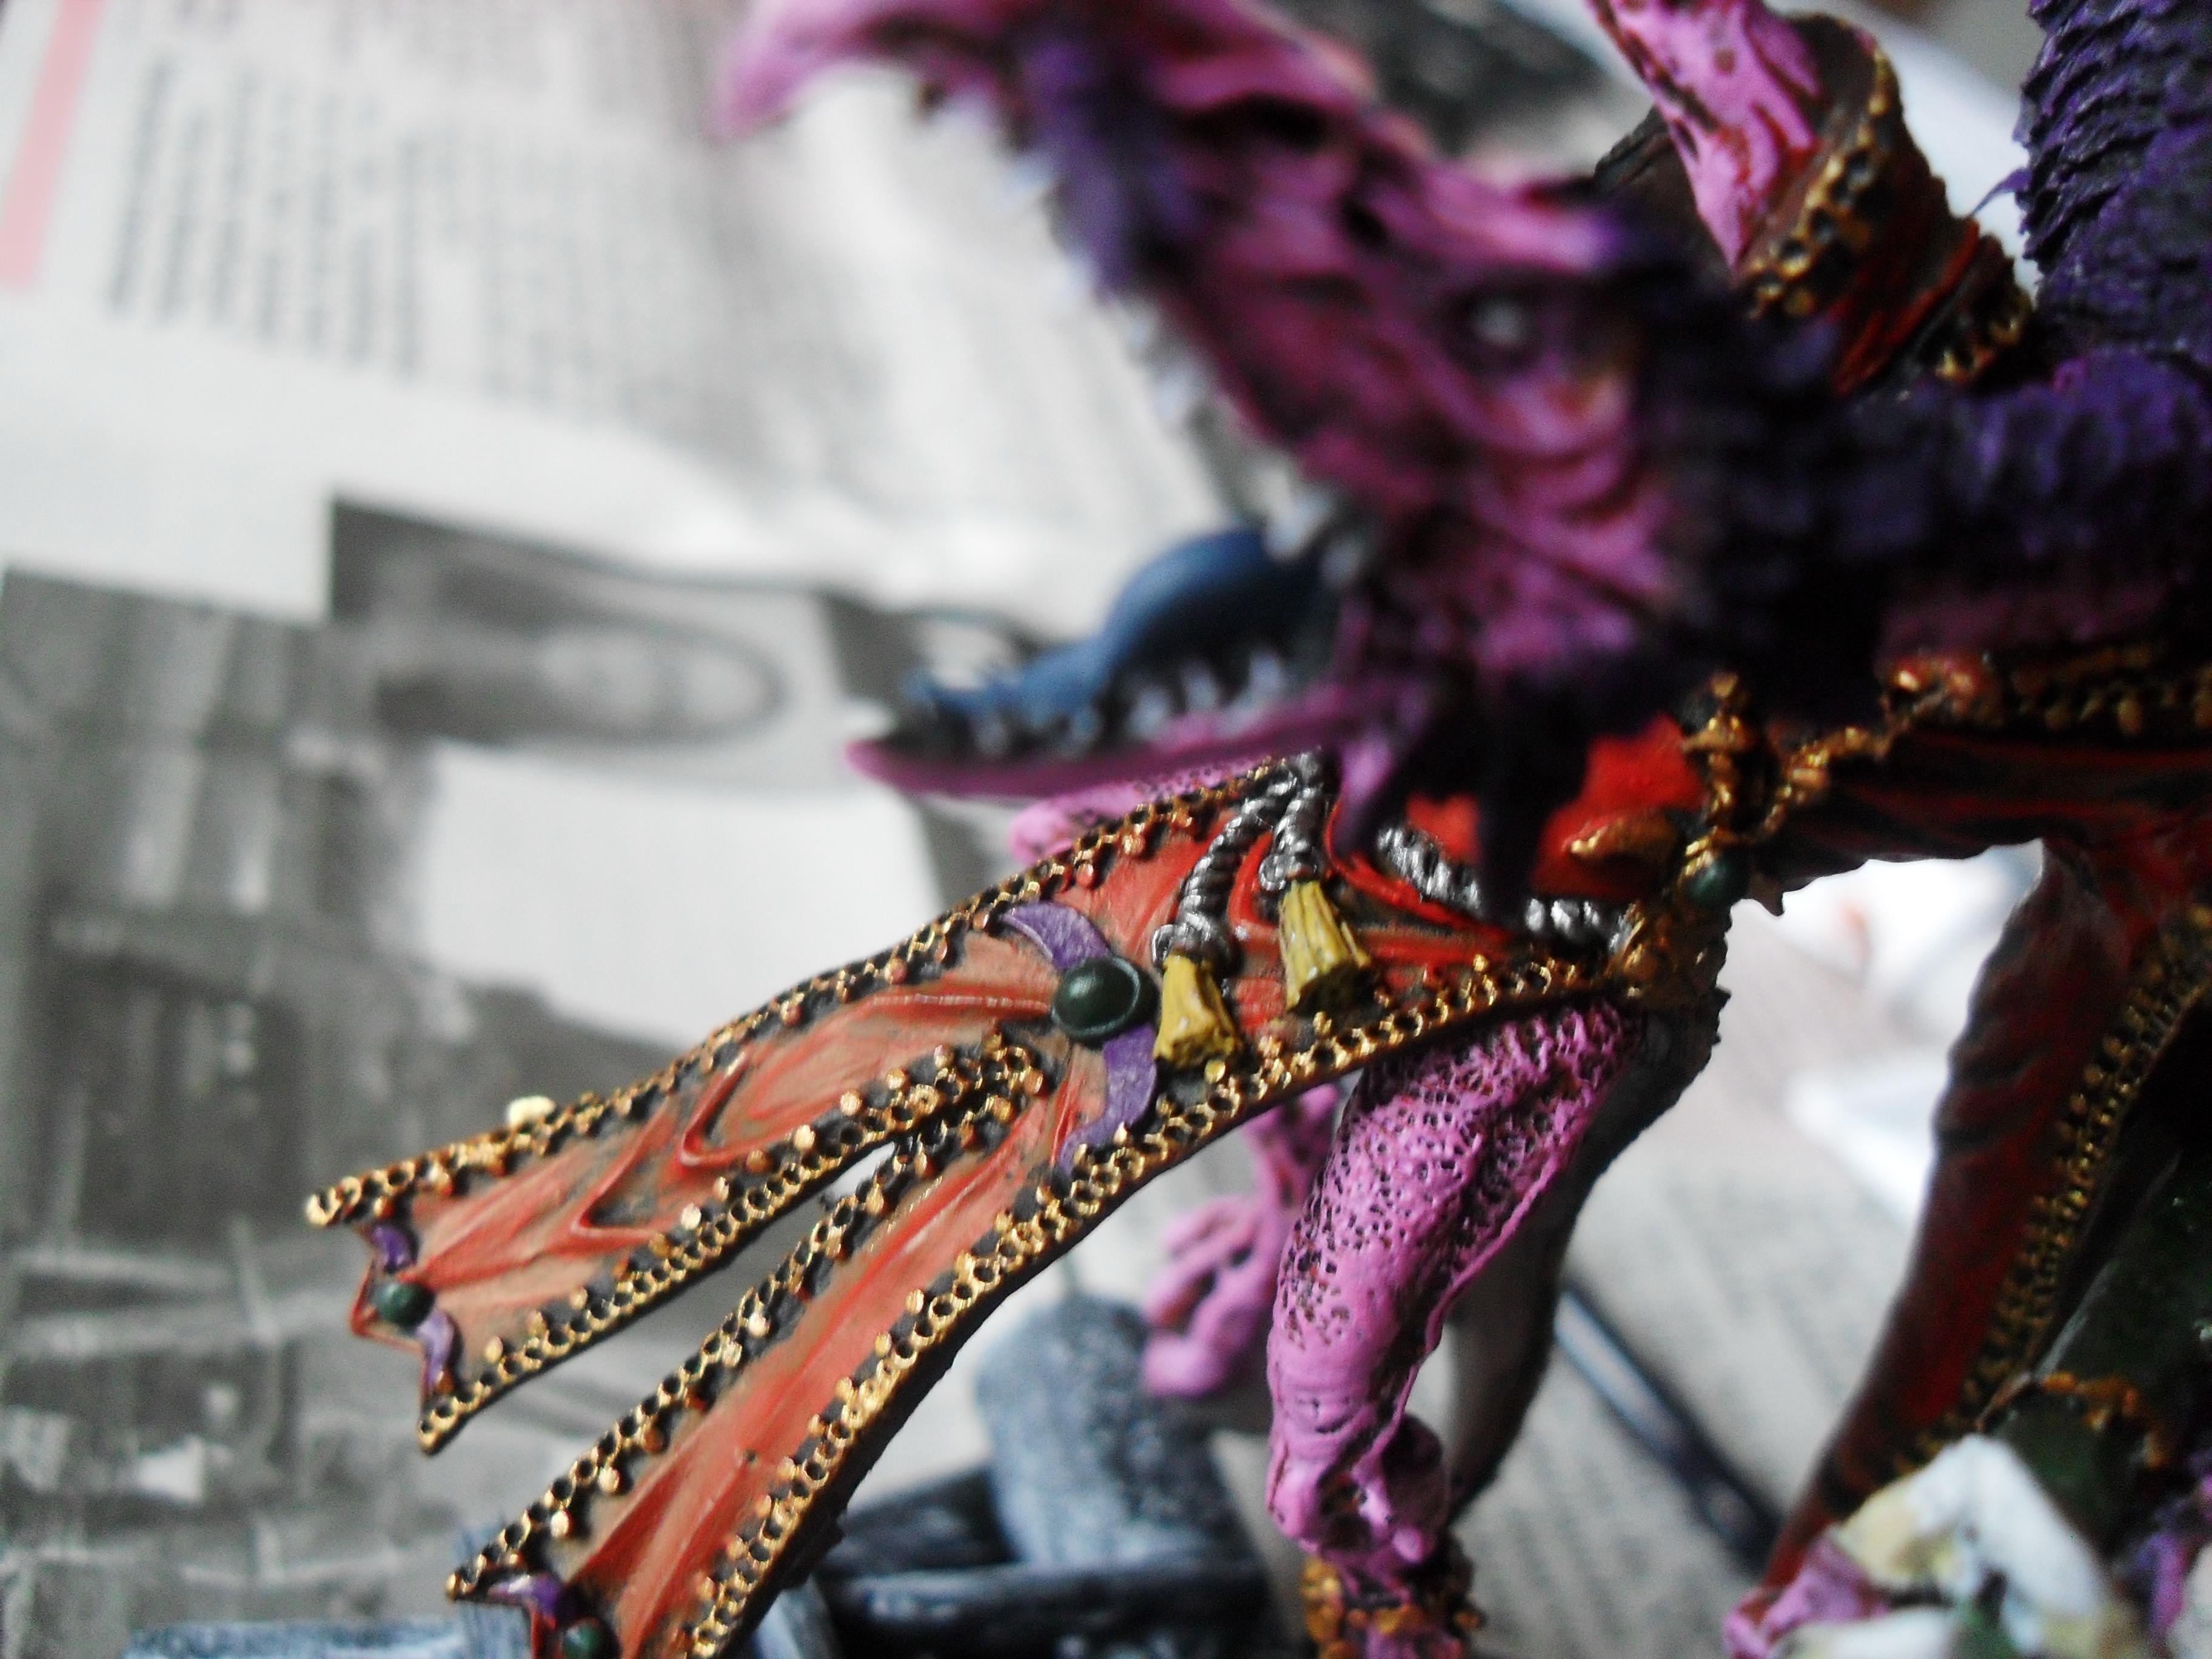 Bird, Change, Cloak, Close Up, Greater Daemon, Greater Deamon, Greater Demon, Lord, Monster, Tzeentch